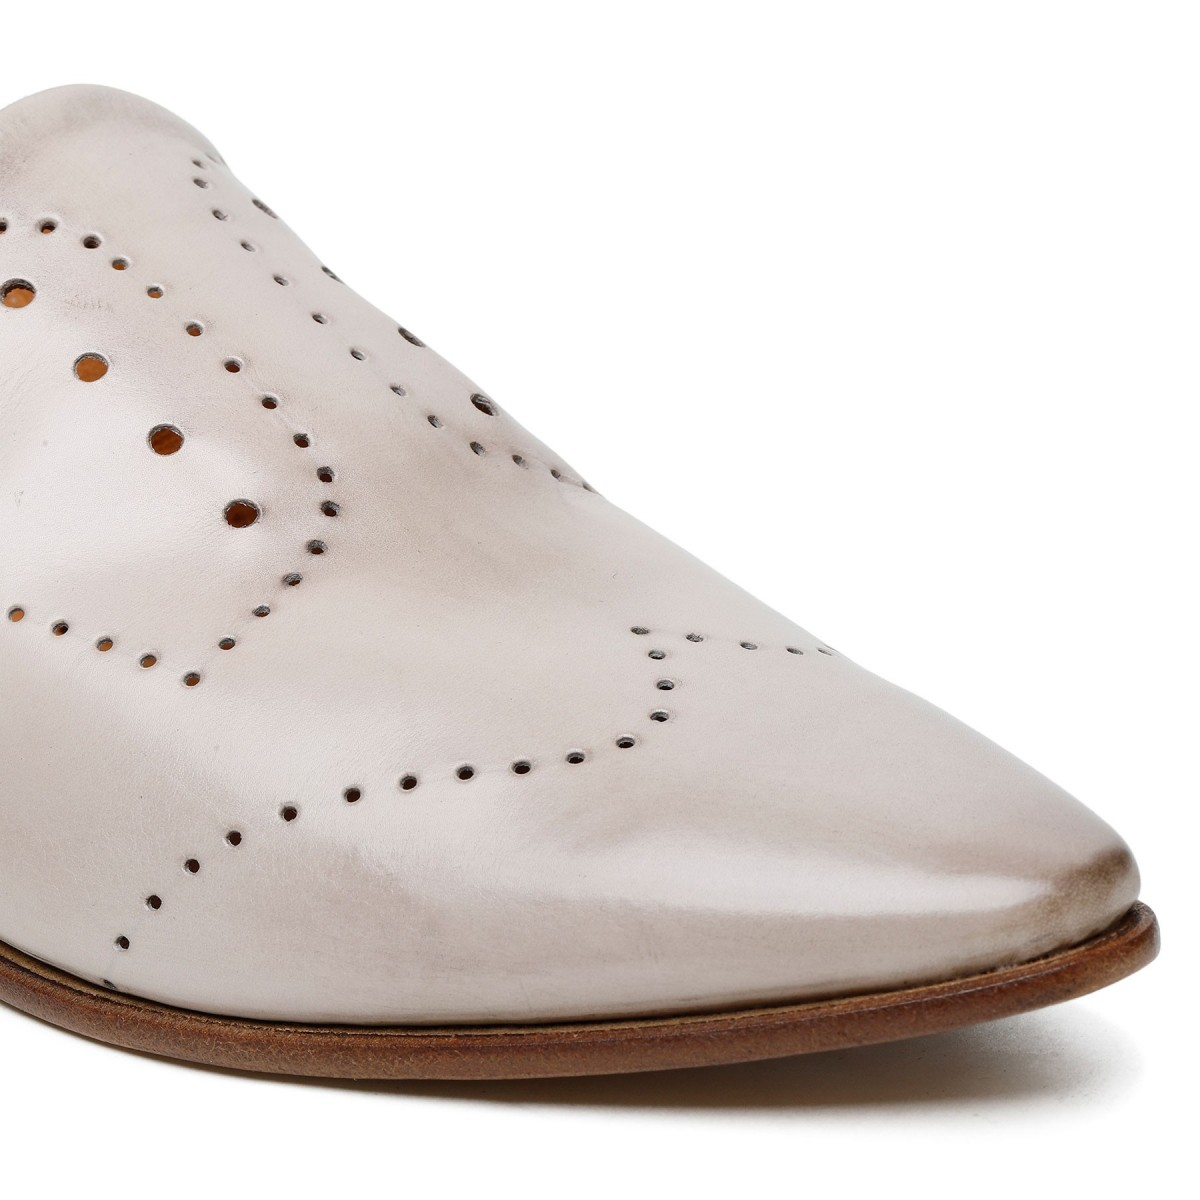 Cream-hue calf leather slippers